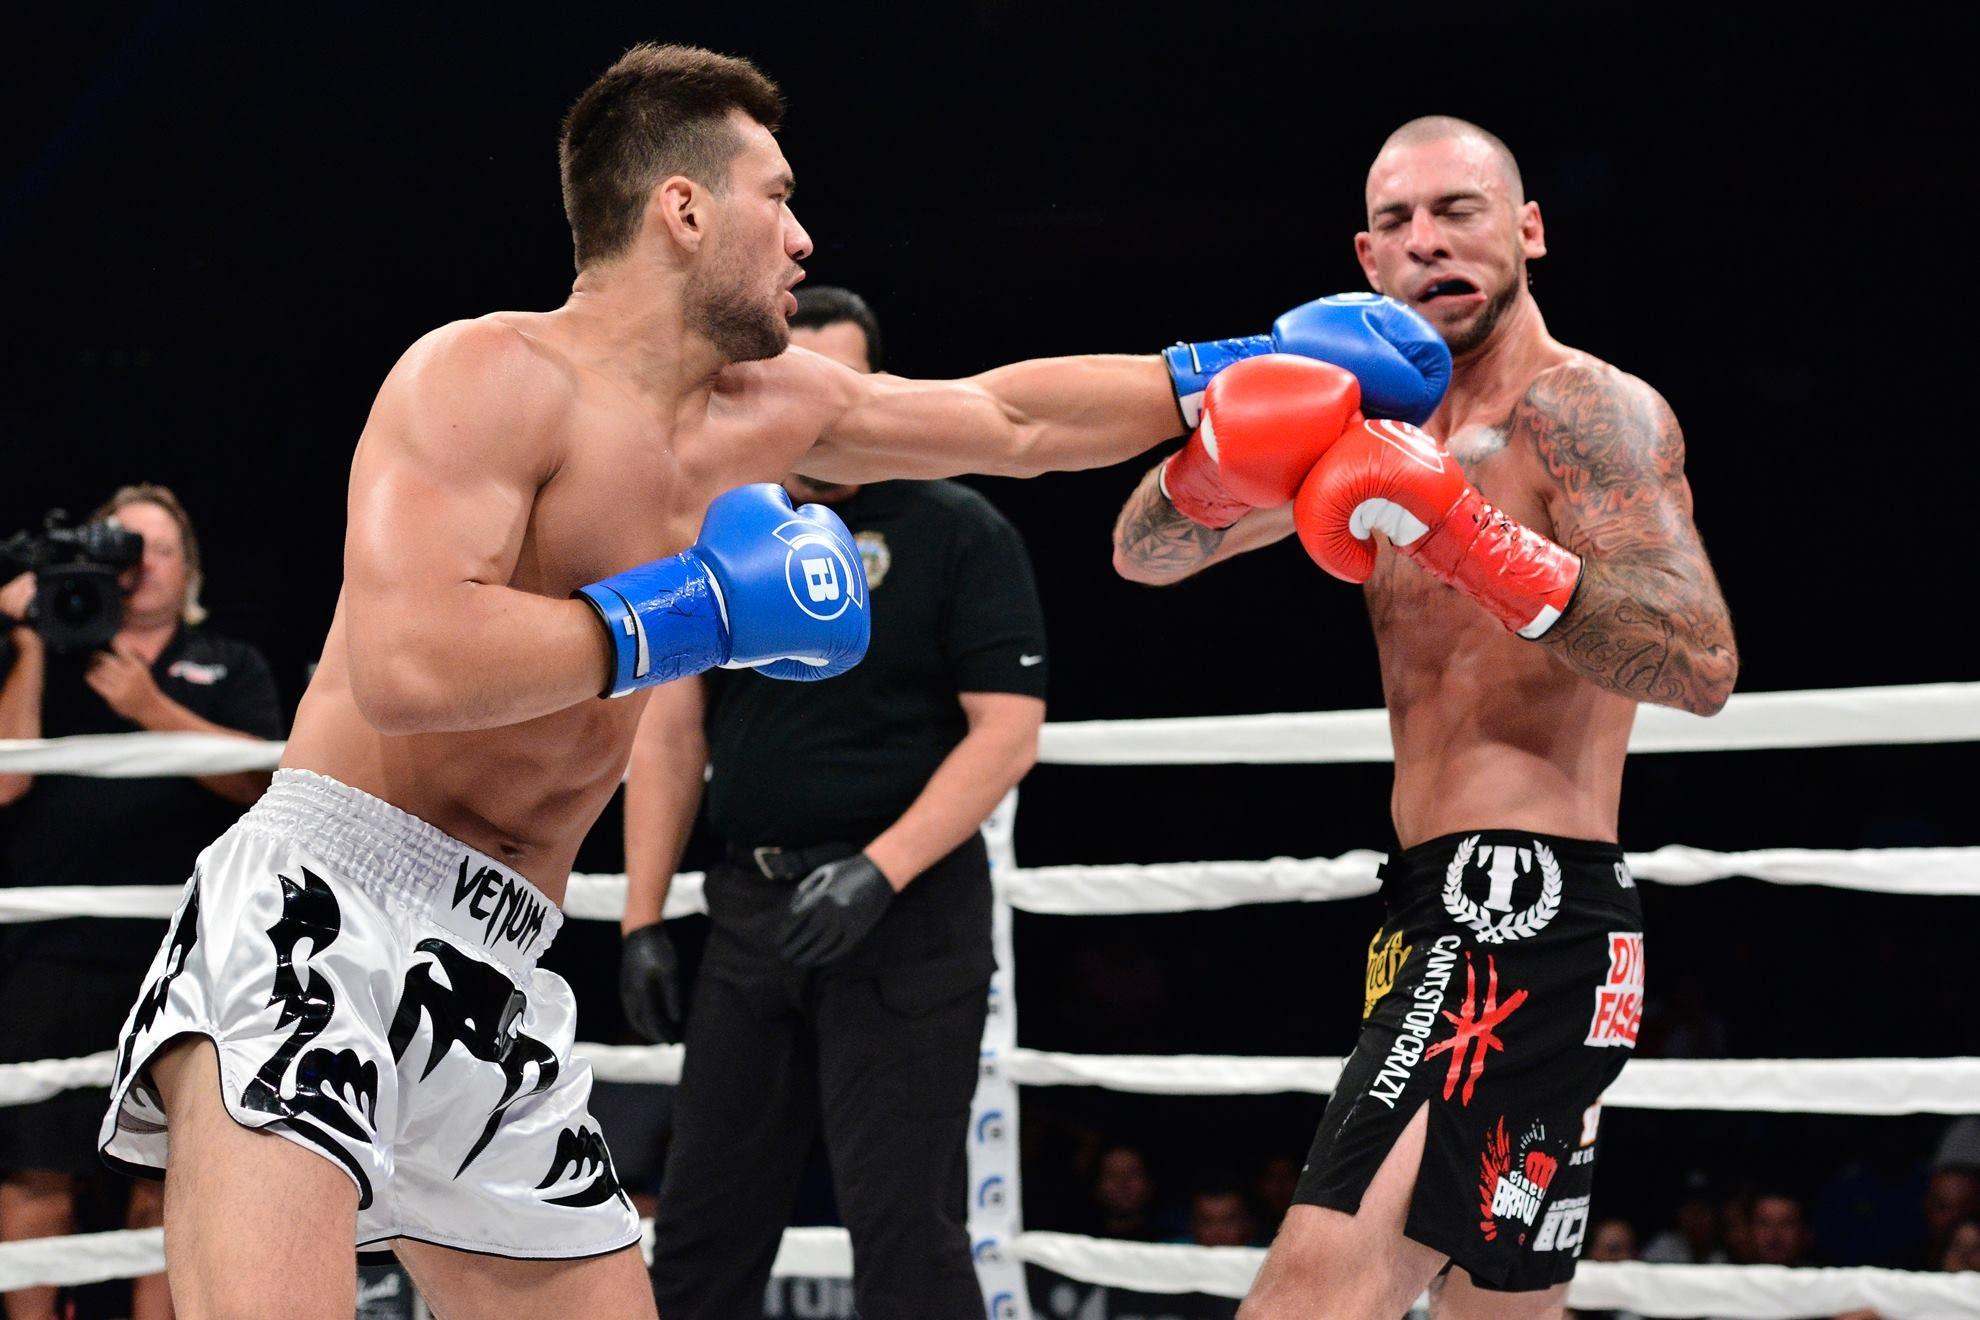 Hisaki Kato Spinning Back Fist KO on Joe Schilling & More